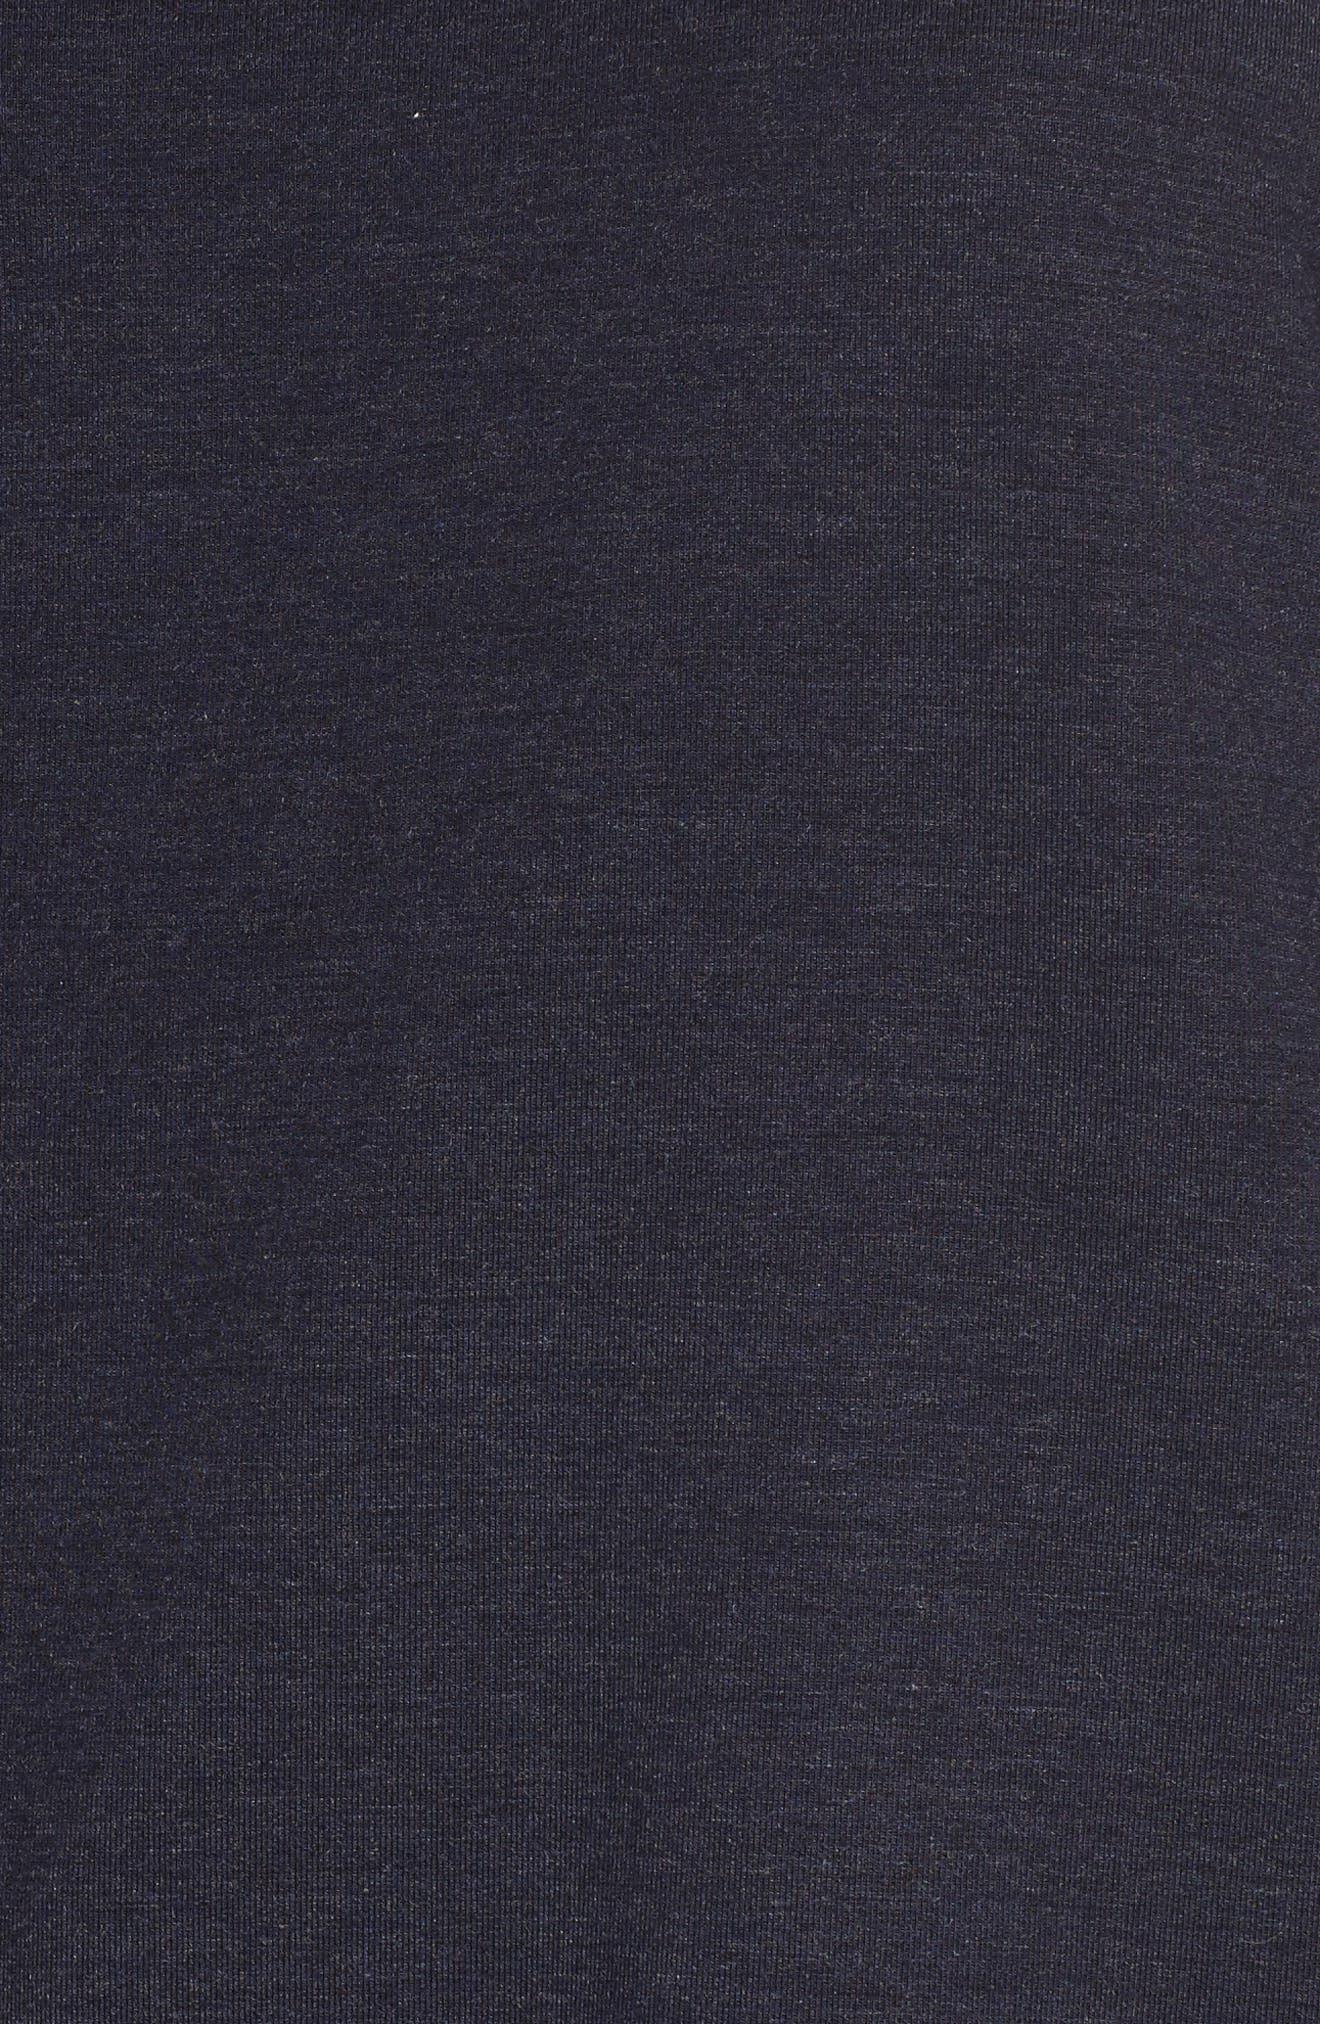 Poplin & Lace Crewneck Sweatshirt,                             Alternate thumbnail 5, color,                             Navy Night